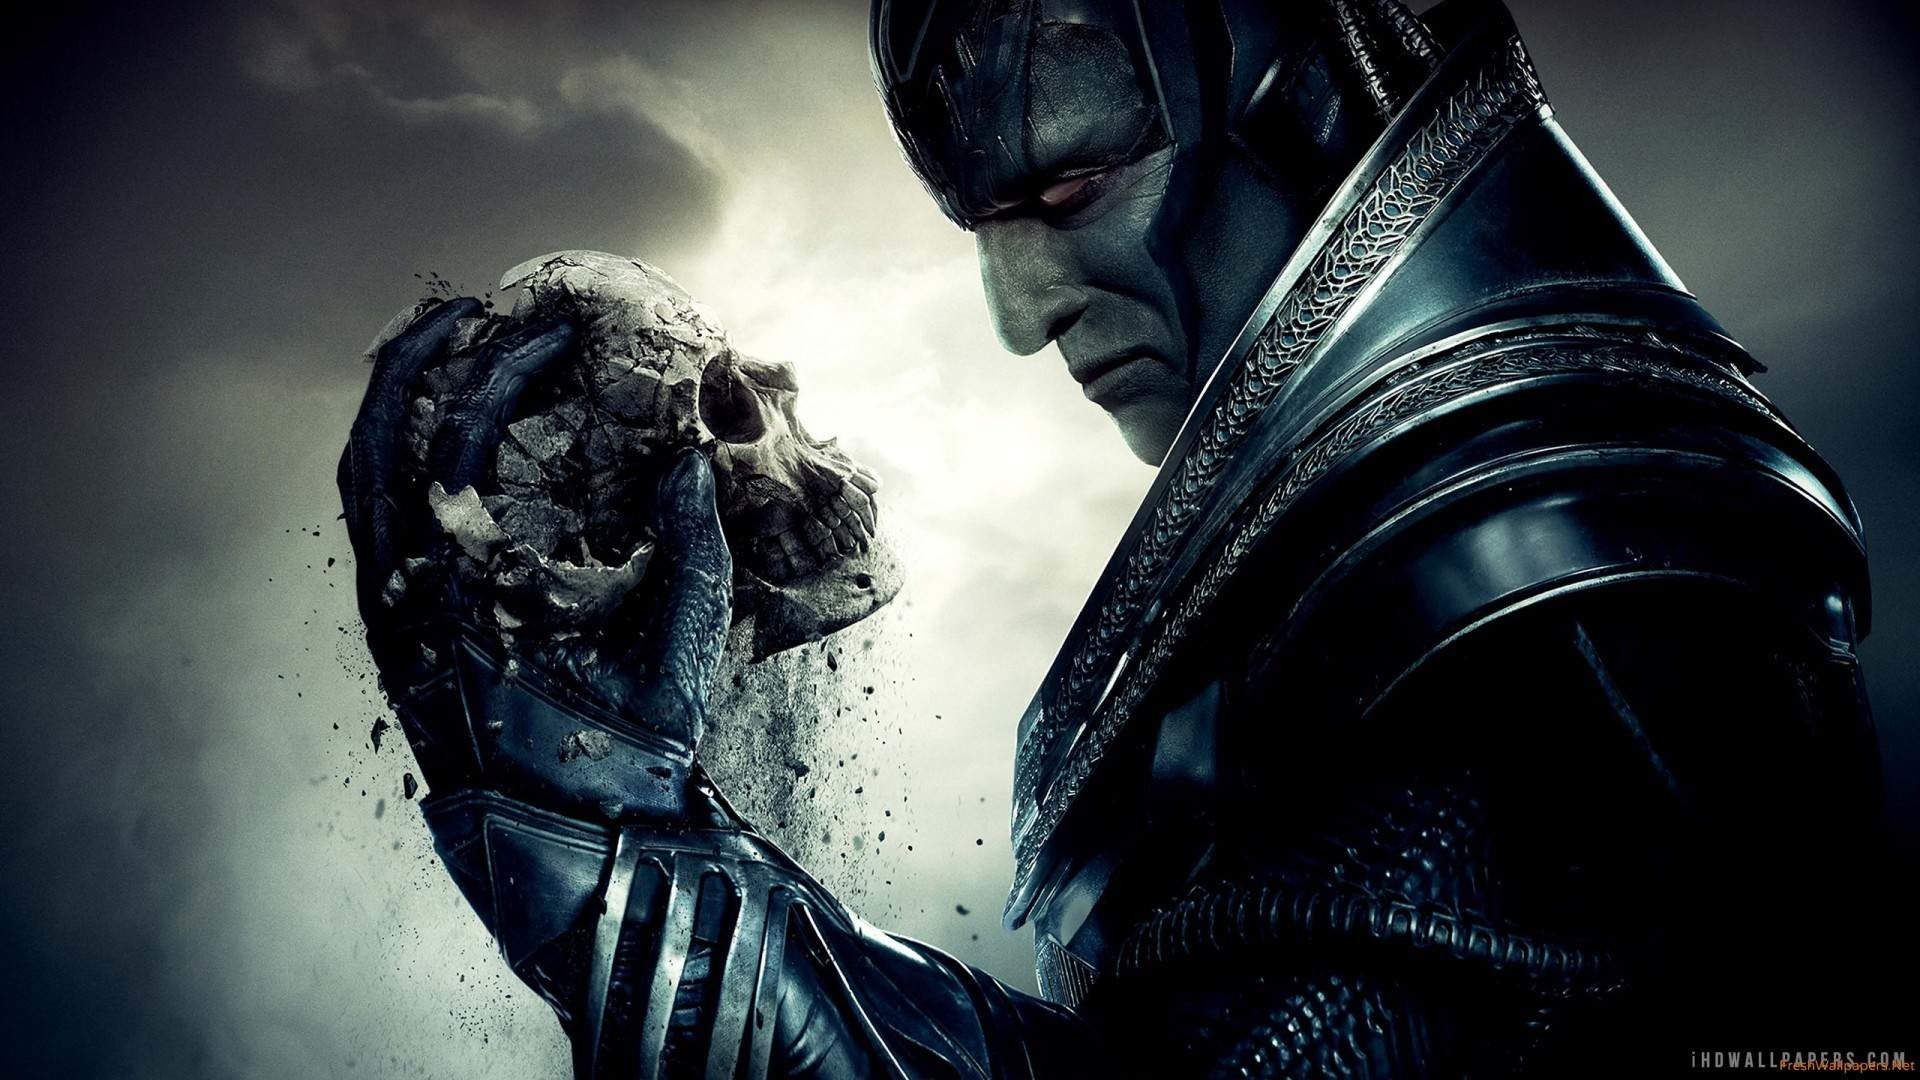 X Men Origins Wolverine Game Wallpaper 63 Images